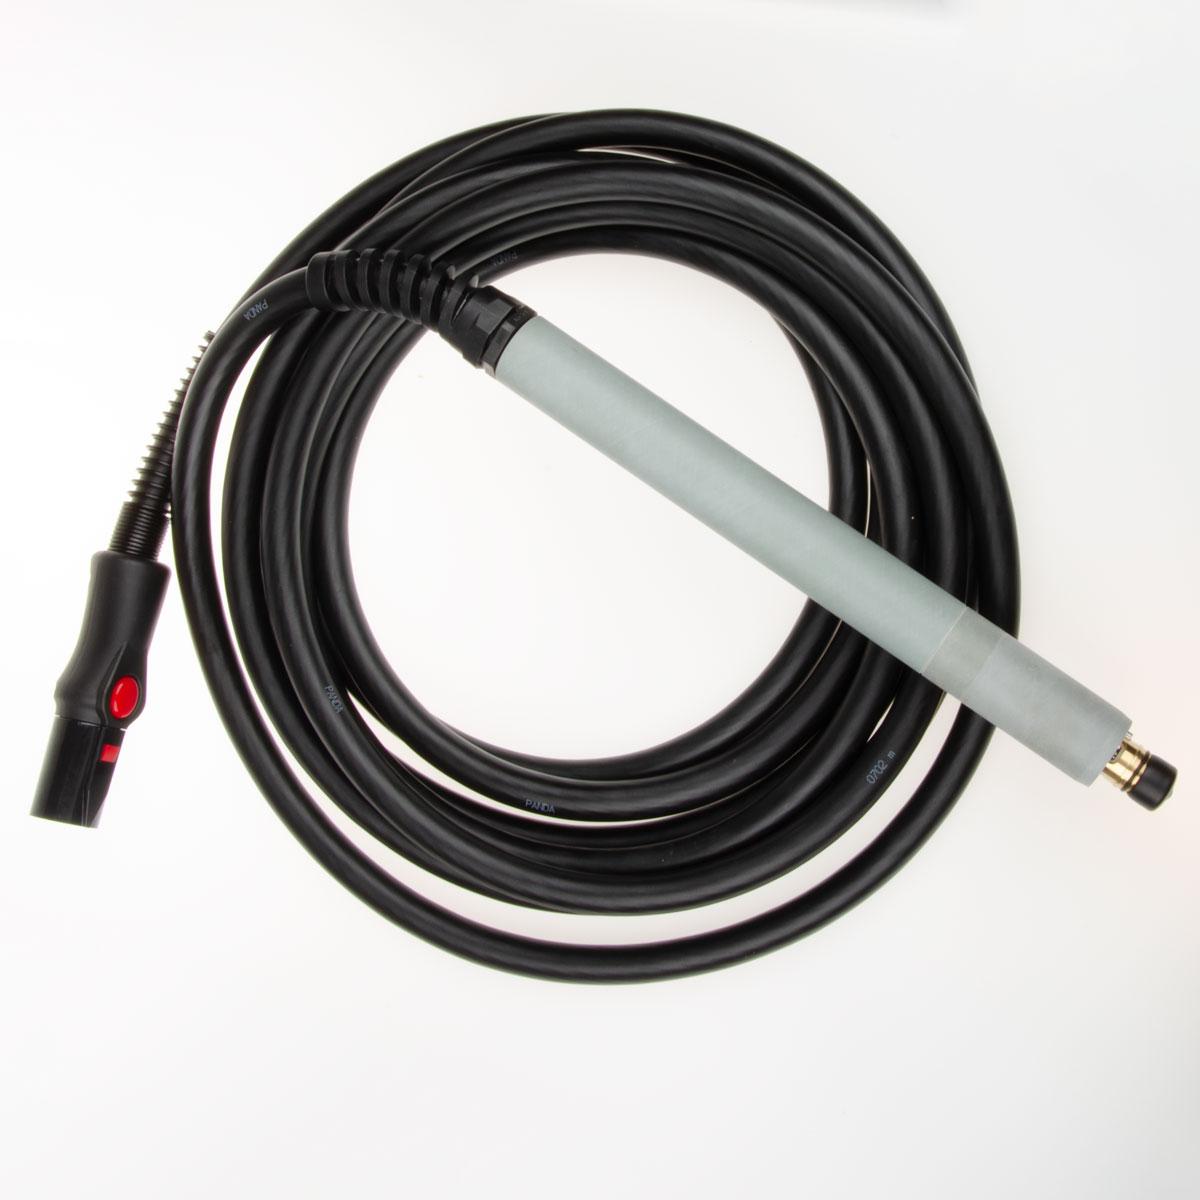 PMX 45XP/65/85/105 Machine Plasma Cutting Torch Torc 059476 059477 059478 059479 059480 Fit For PMX 45XP/65/85/105 OEM